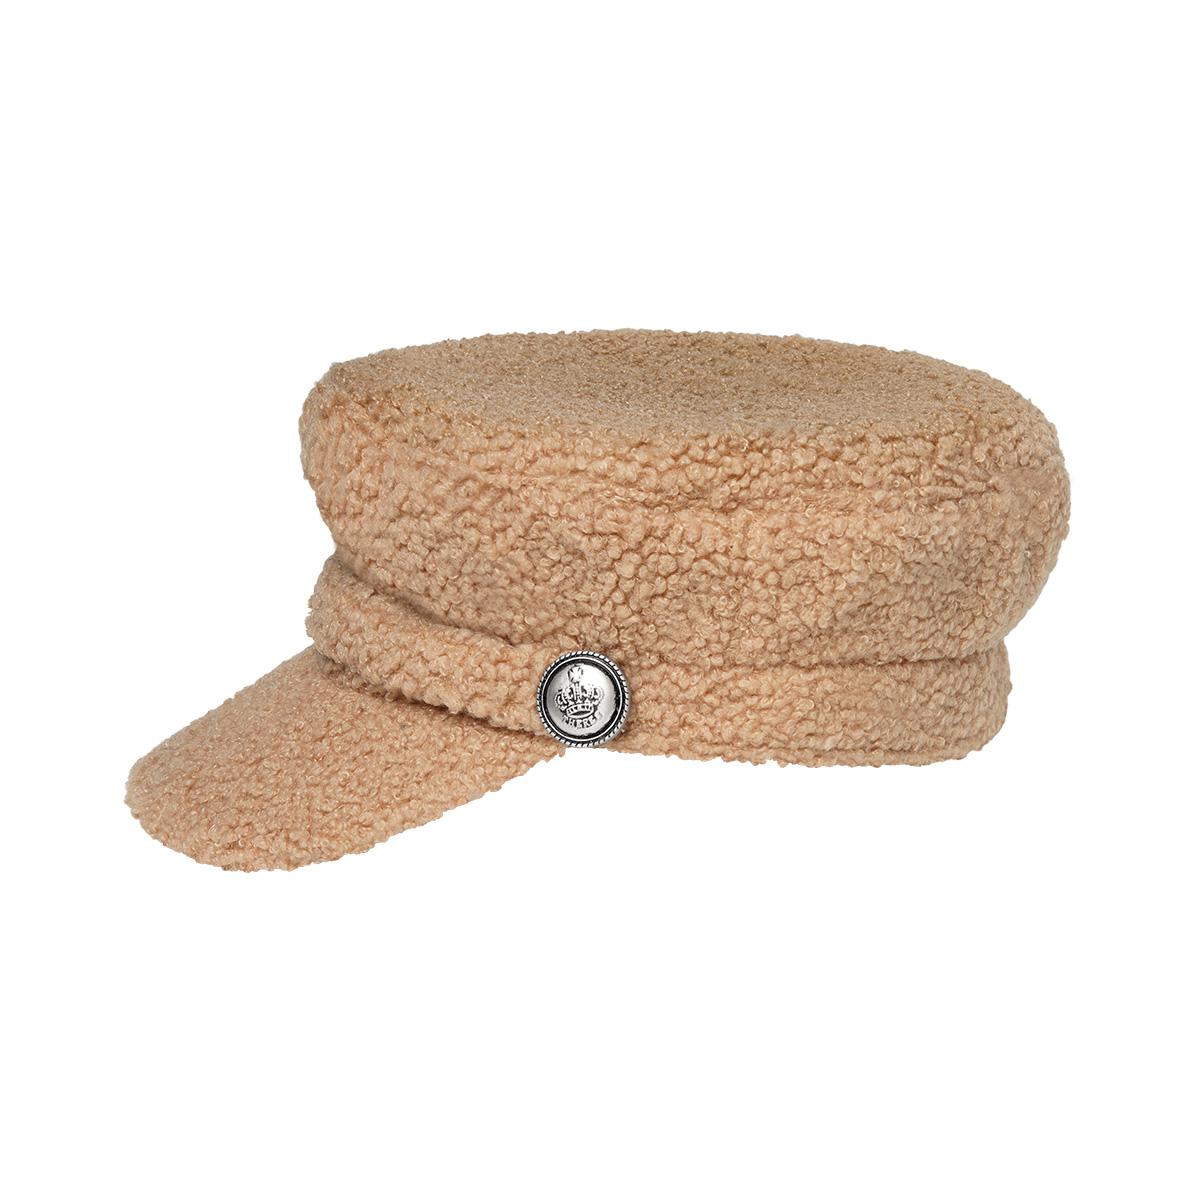 Sombreros Brave the Ocean